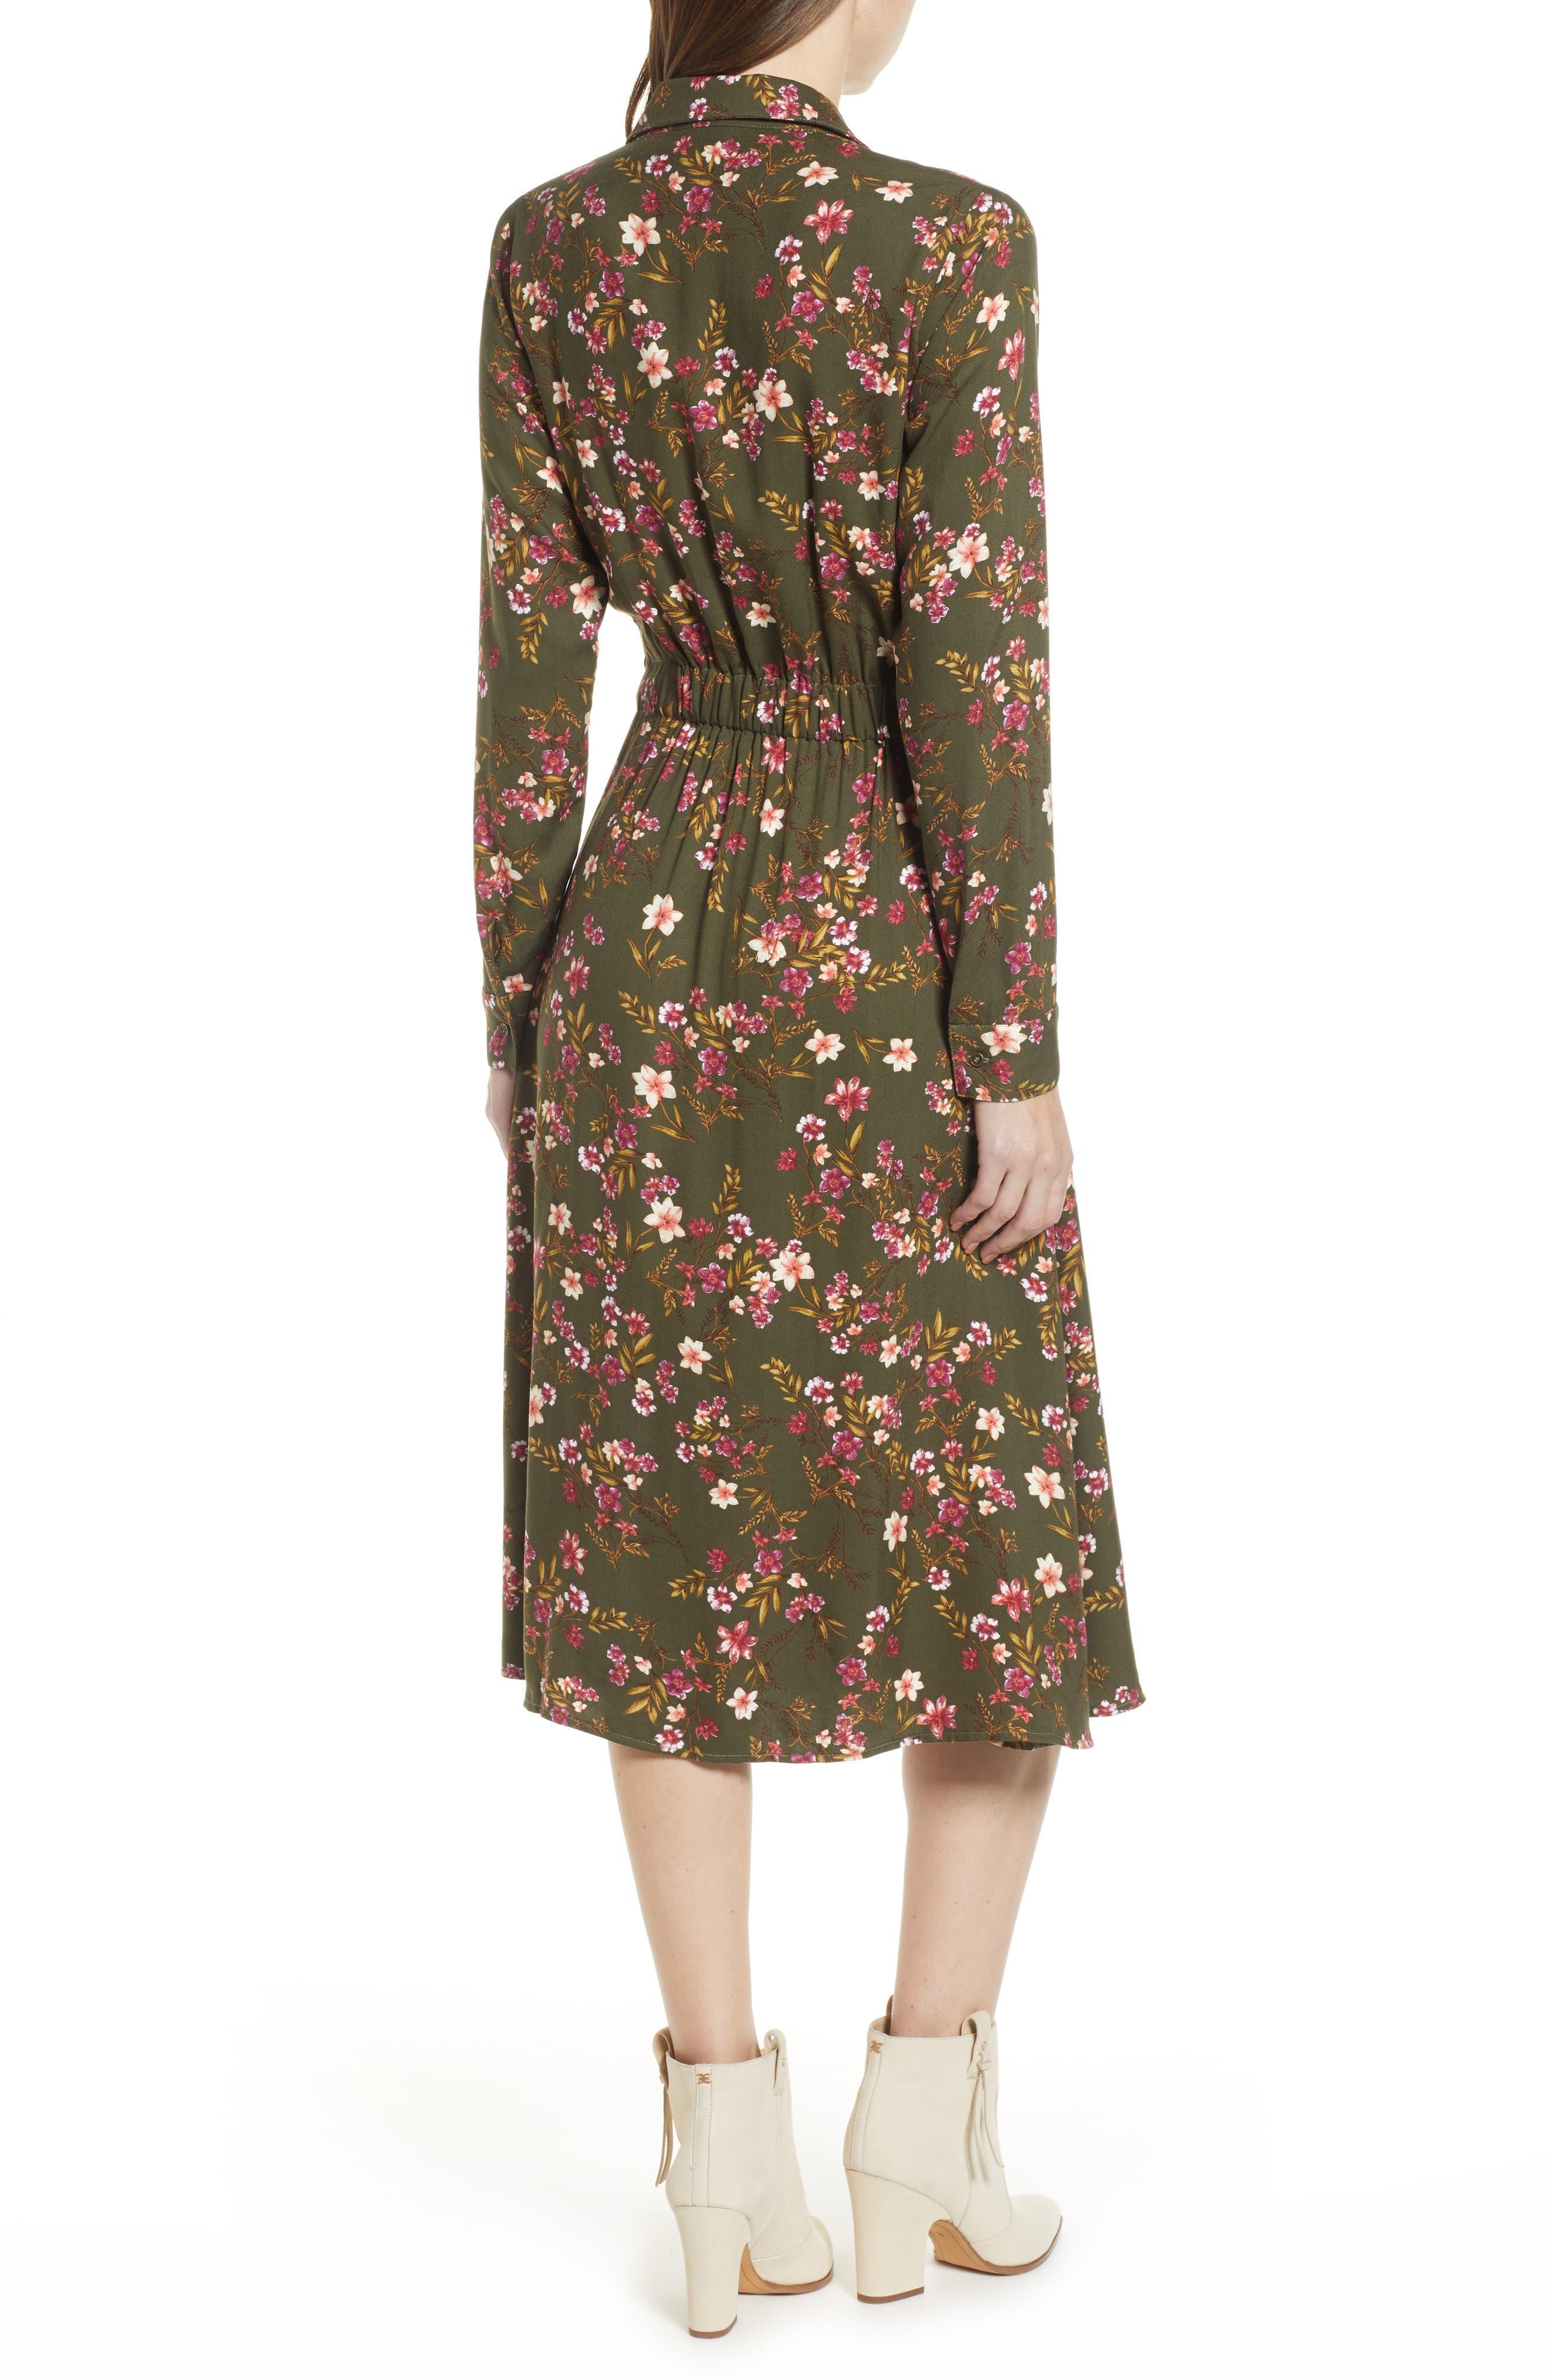 BP., Floral Midi Dress, Alternate thumbnail 2, color, OLIVE BURNT SAVANNAH FLORAL